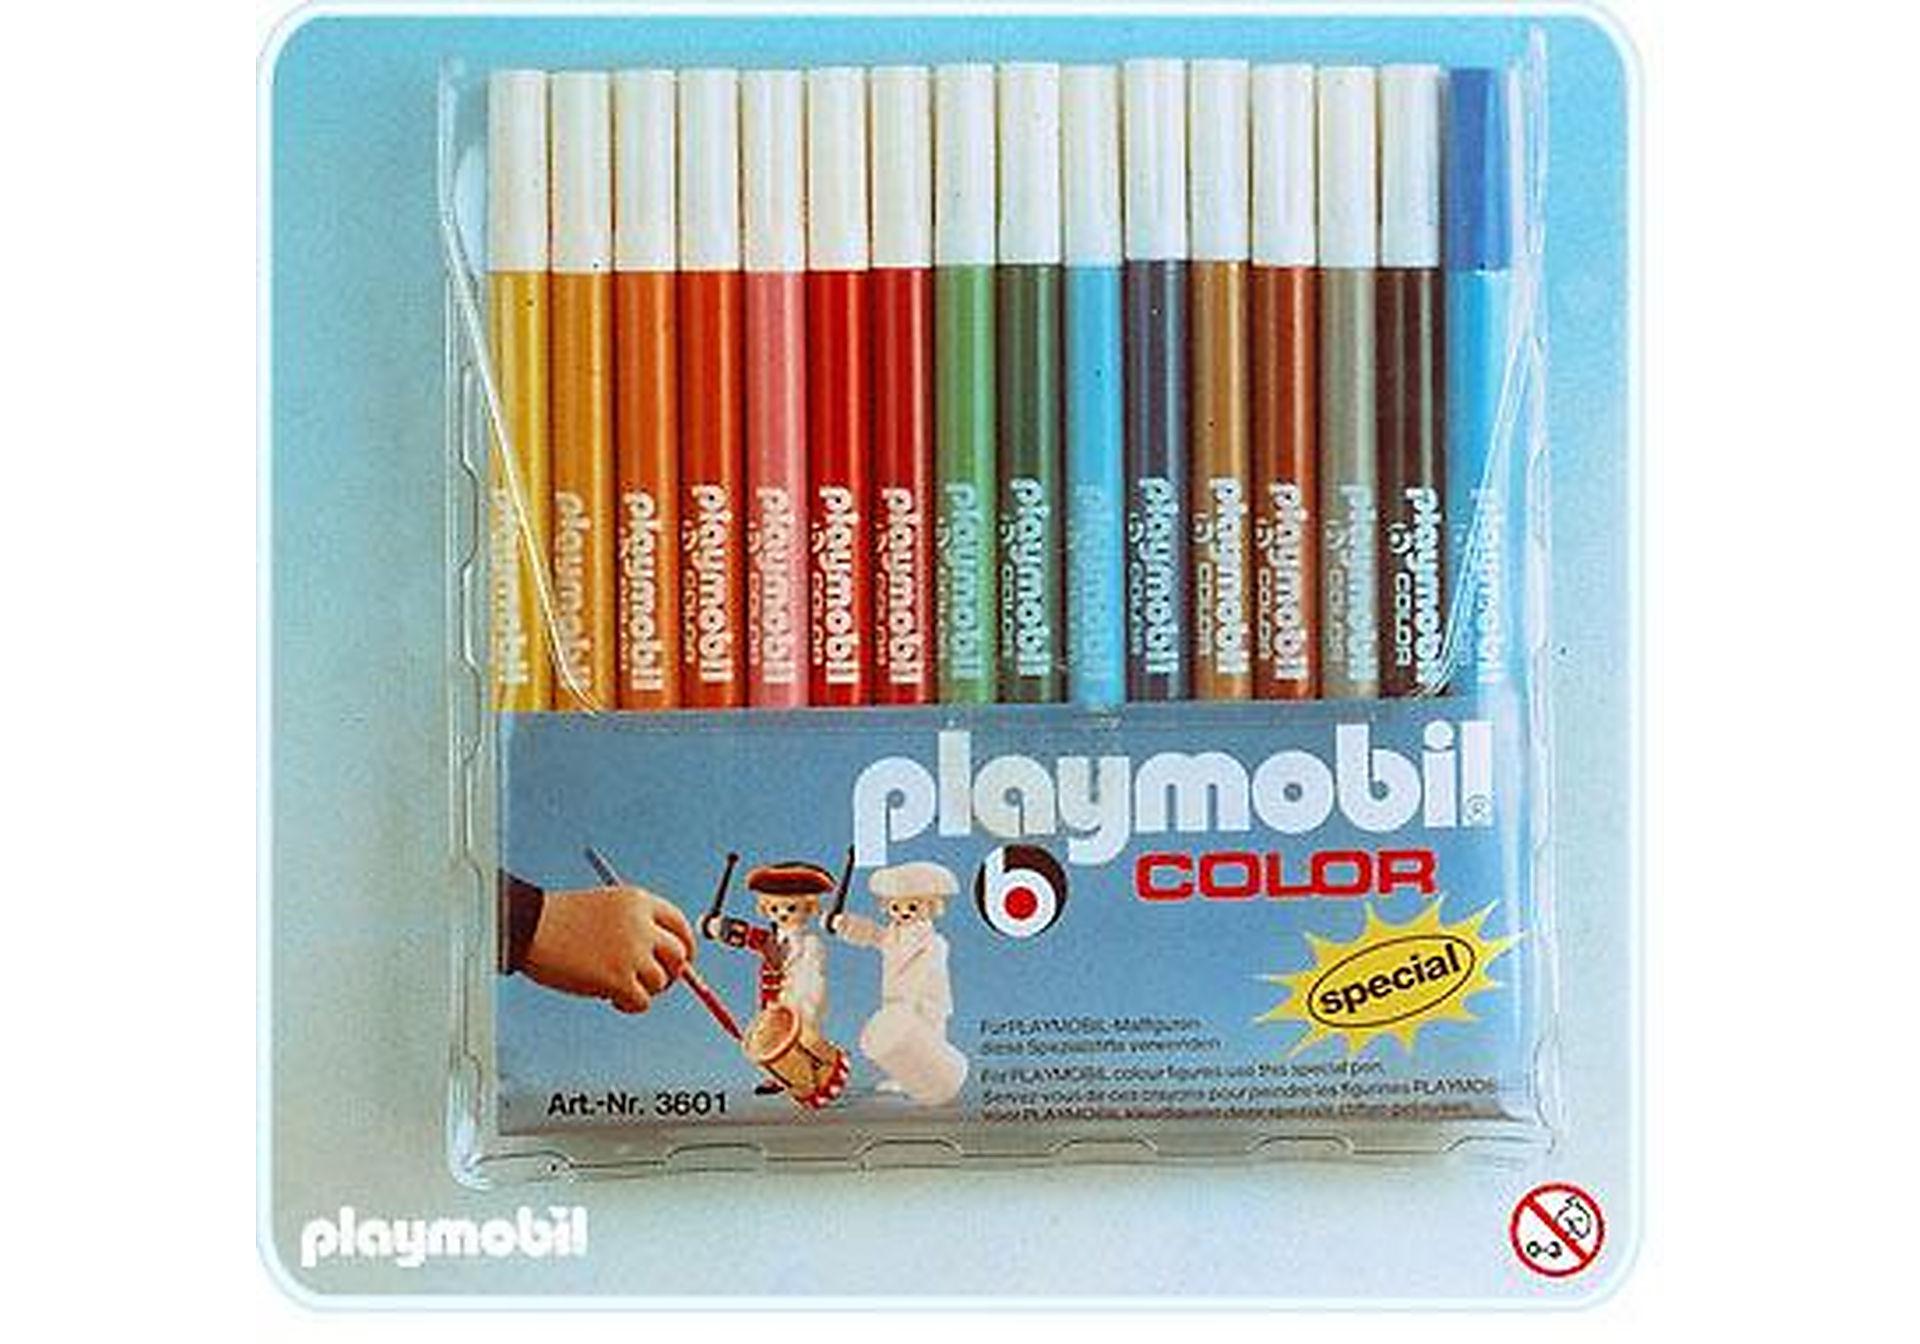 http://media.playmobil.com/i/playmobil/3601-A_product_detail/16 Spez.-Stifte im Etui